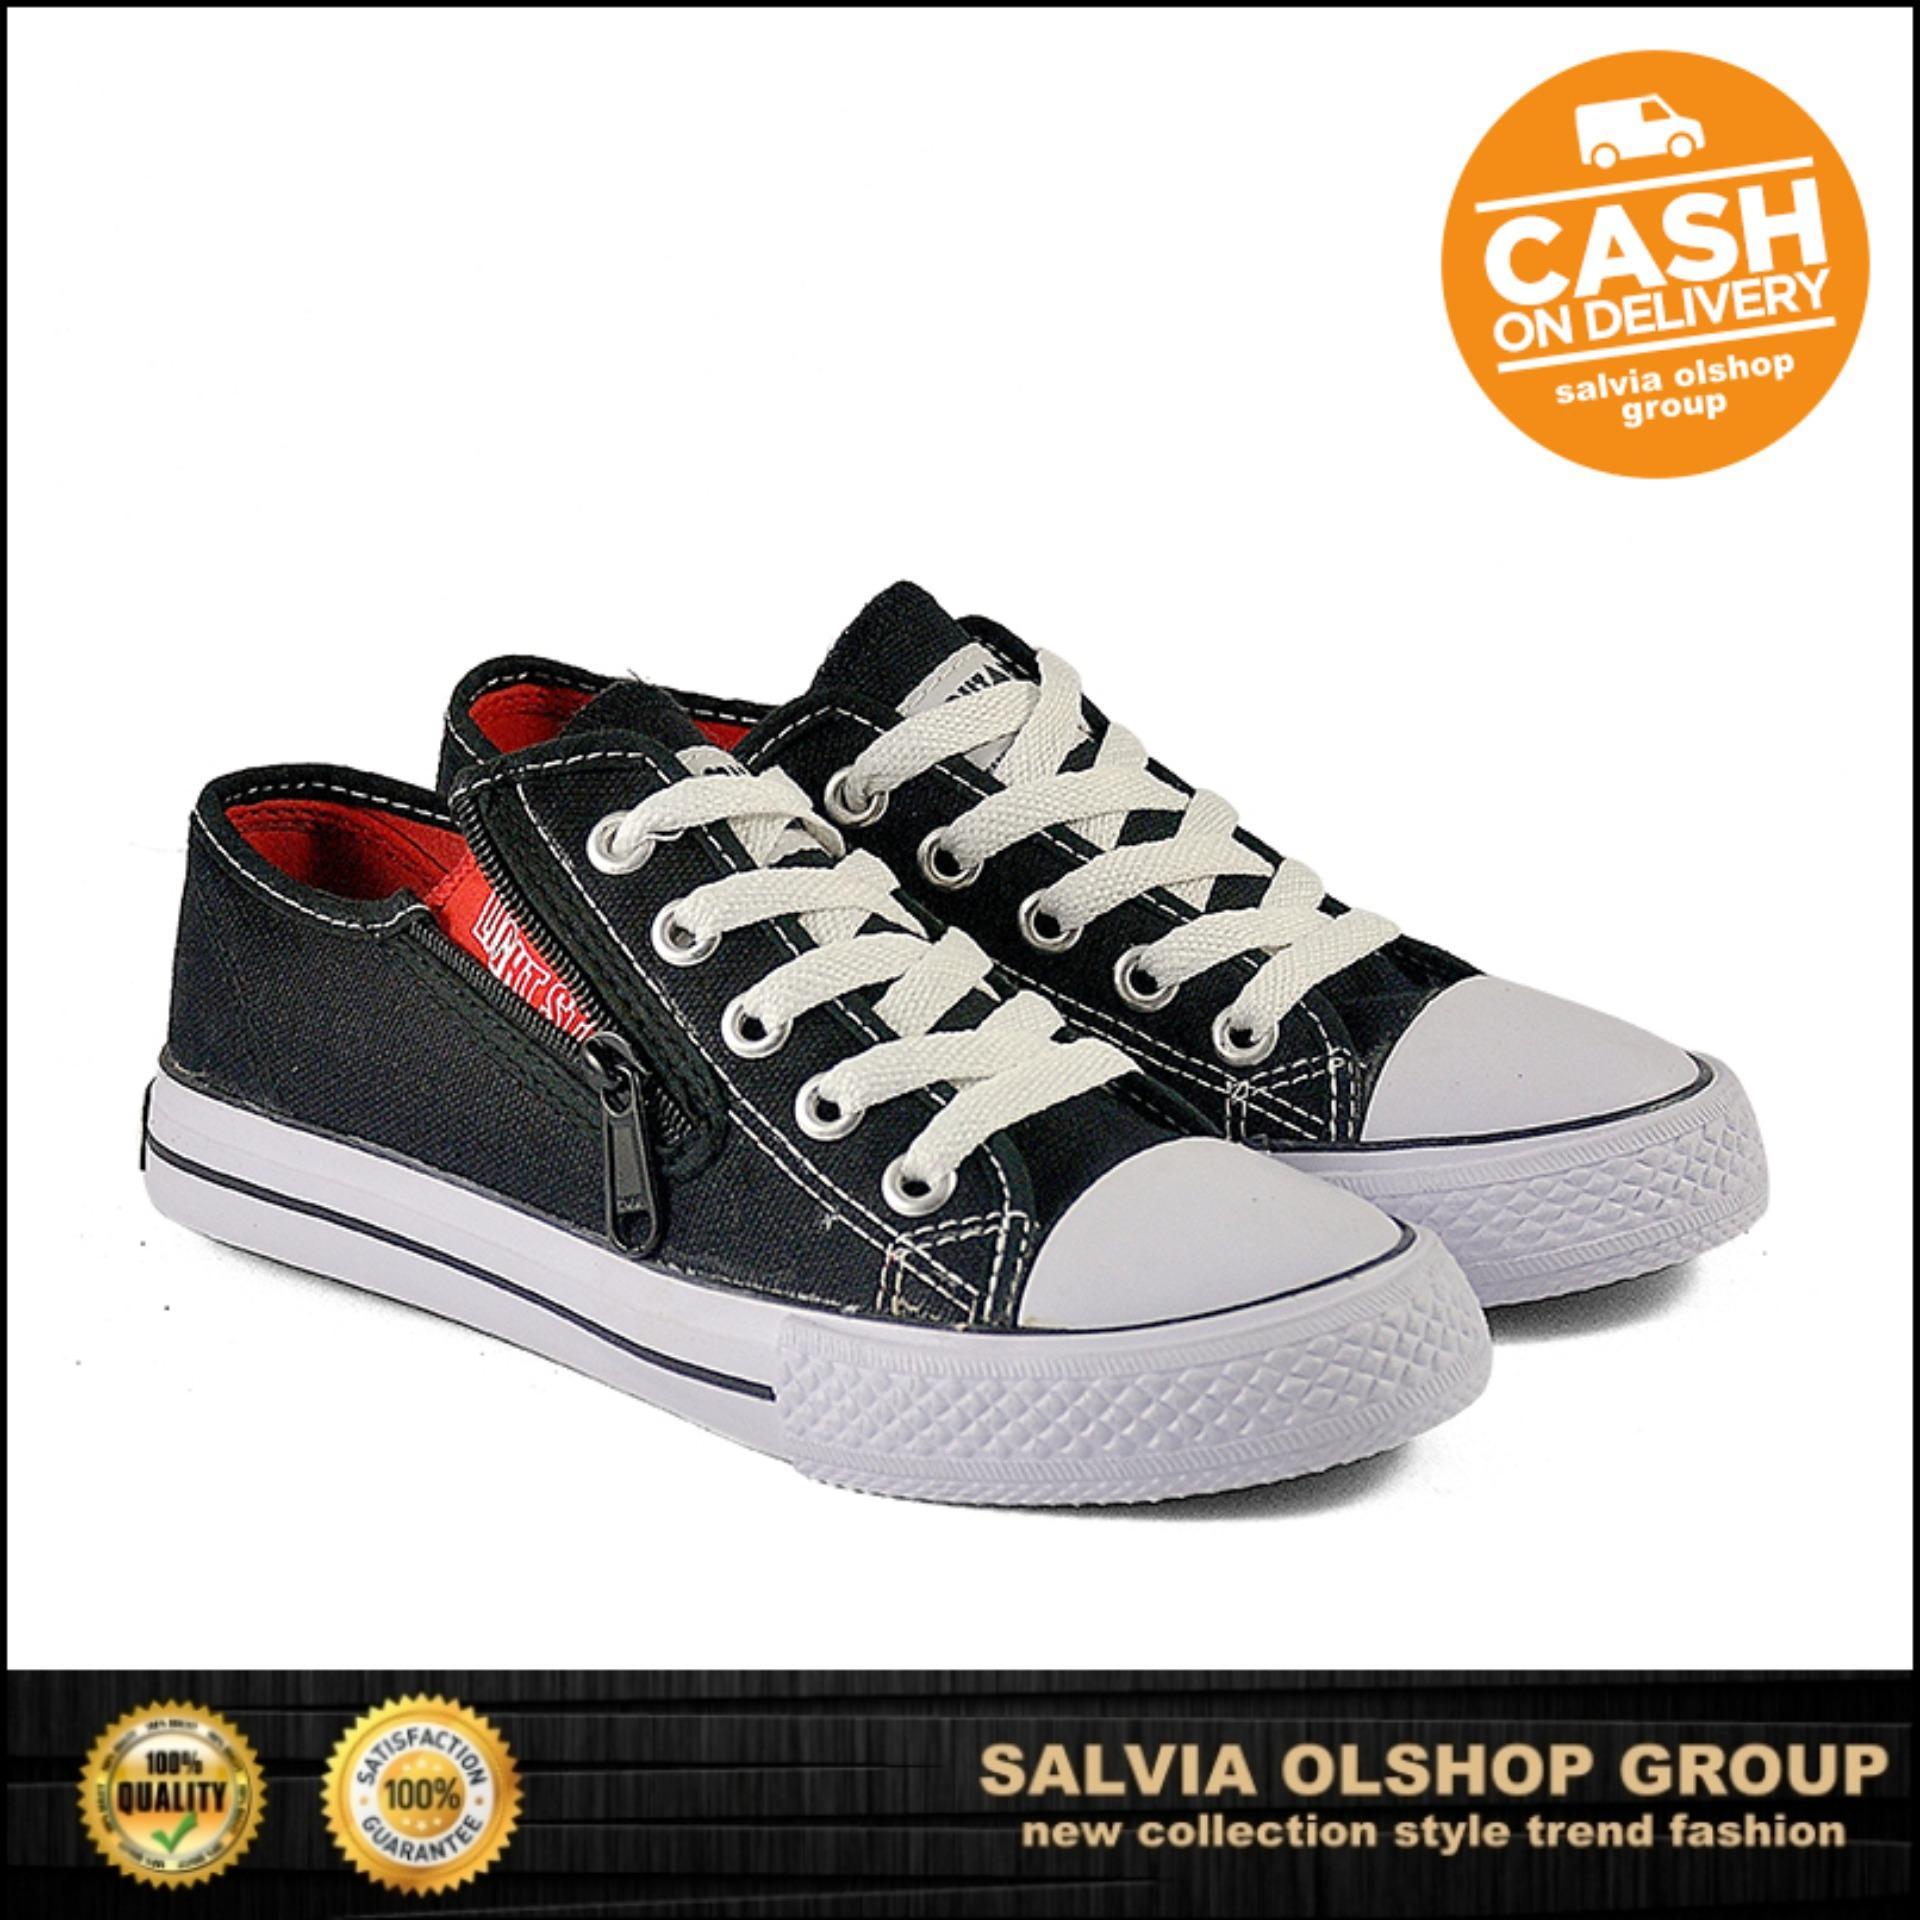 Java Sepatu Anak Laki Lucu Dan Modis Model Terbaru LST 105 - Hitam 82bfc96f8b